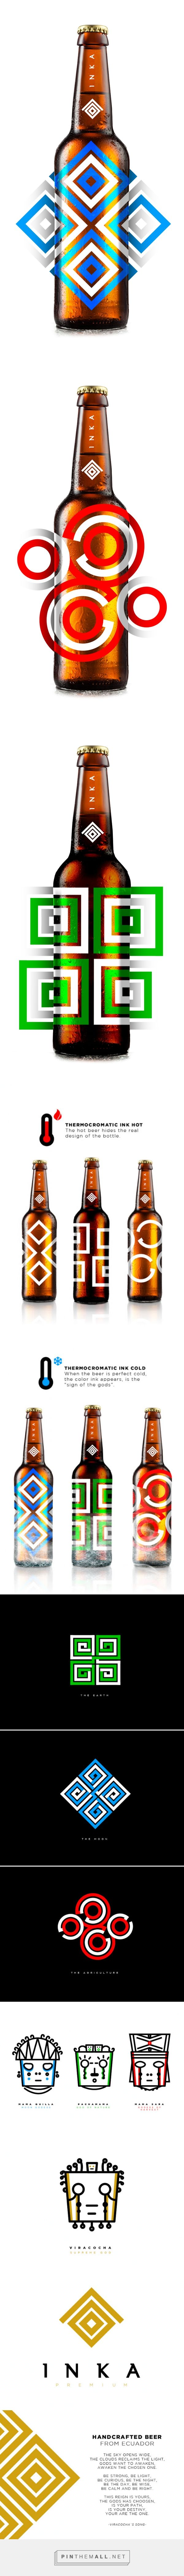 Inka Premium #Beer #packaging#branding http://www.packagingoftheworld.com/2015/01/inka-premium-beer-concept.html